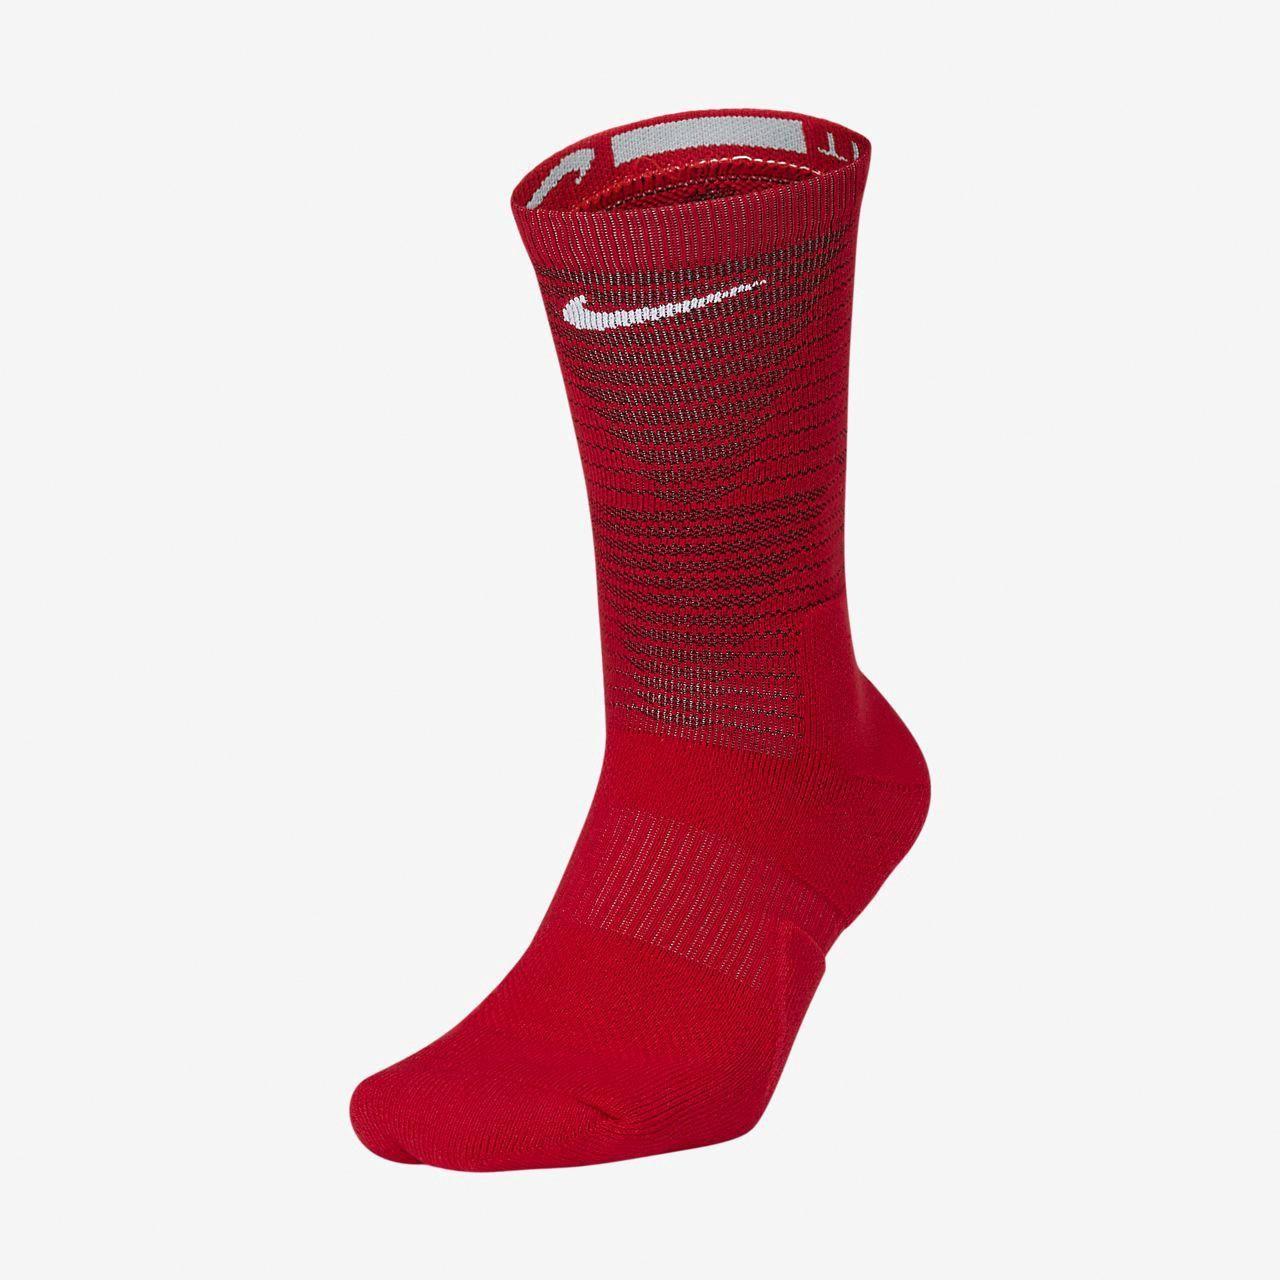 nike elite disrupter basketball socks l w 10 13 m 8 12